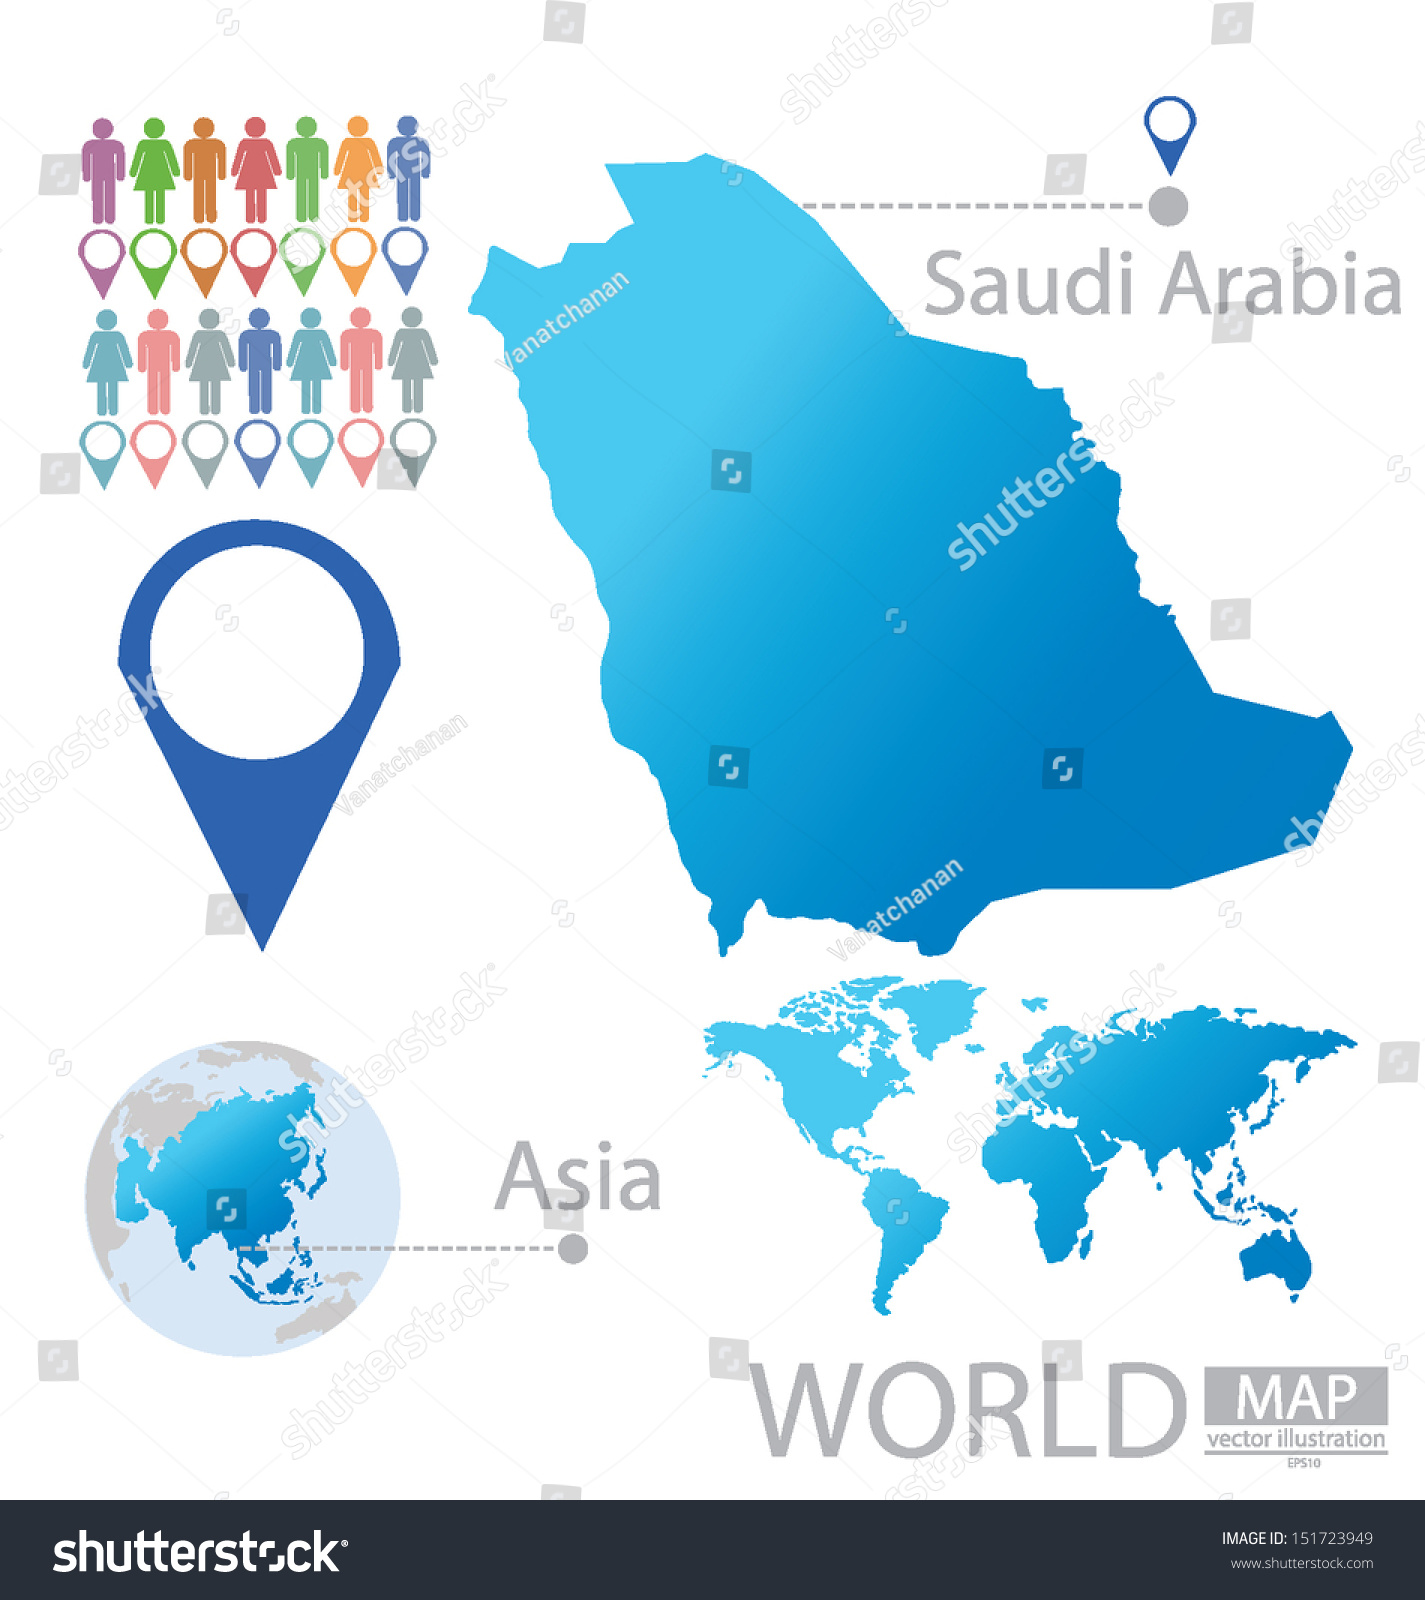 Kingdom Saudi Arabia Asia World Map Stock Vector - Saudi arabia world map